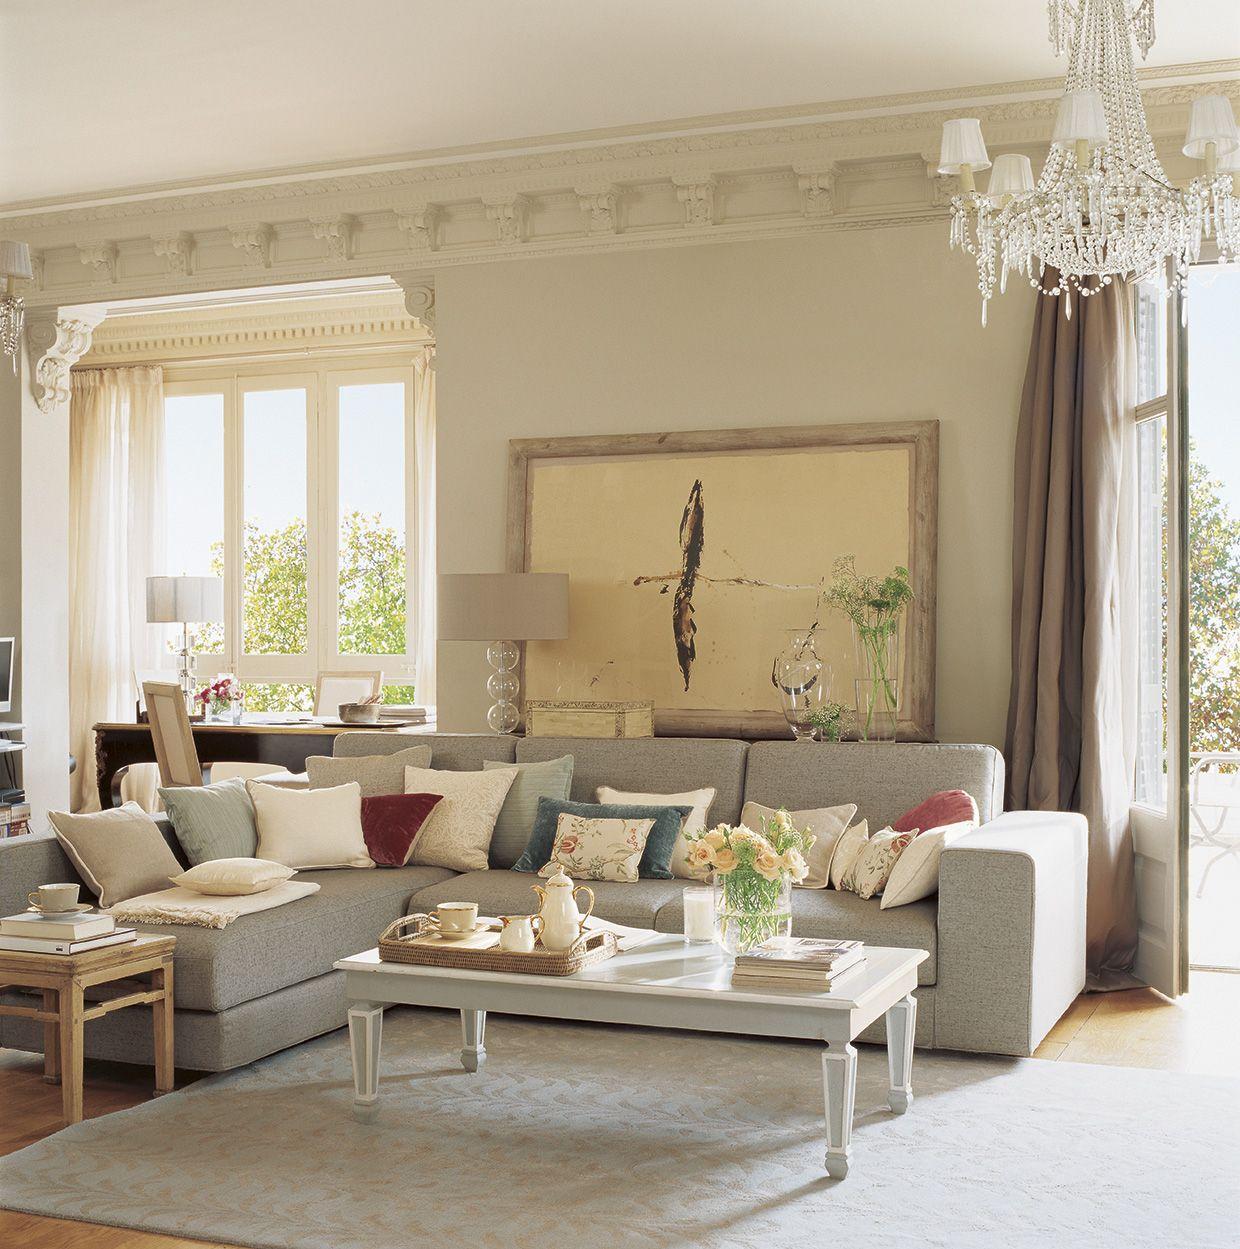 Salones con chaise longue rinconera en u con cama boogie chaise sofs sofs y sofa ios para el - Merkamueble sofas cheslong ...